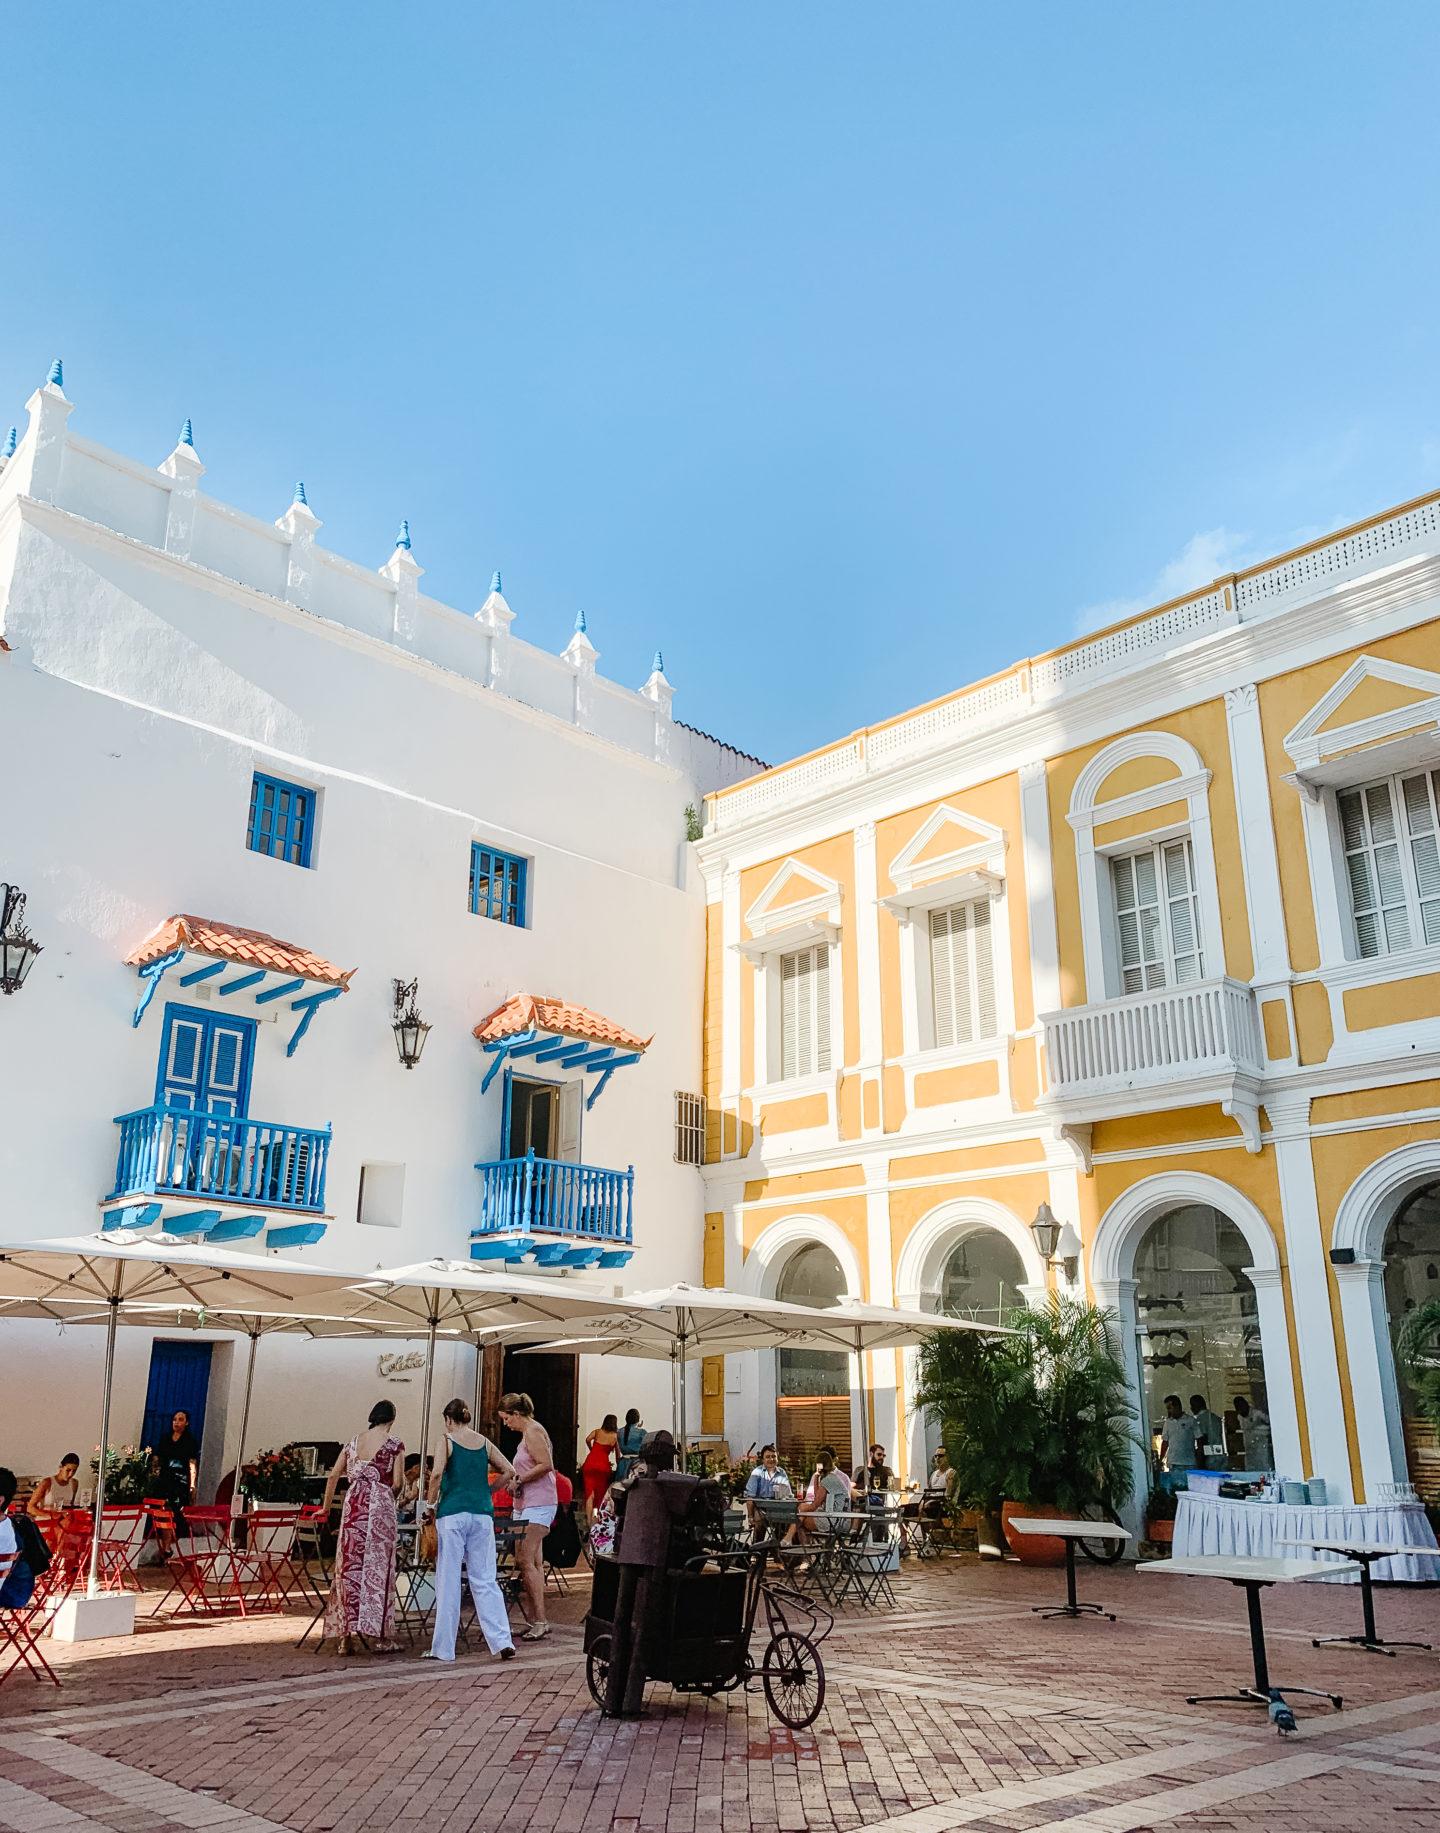 Plazas in Cartagena